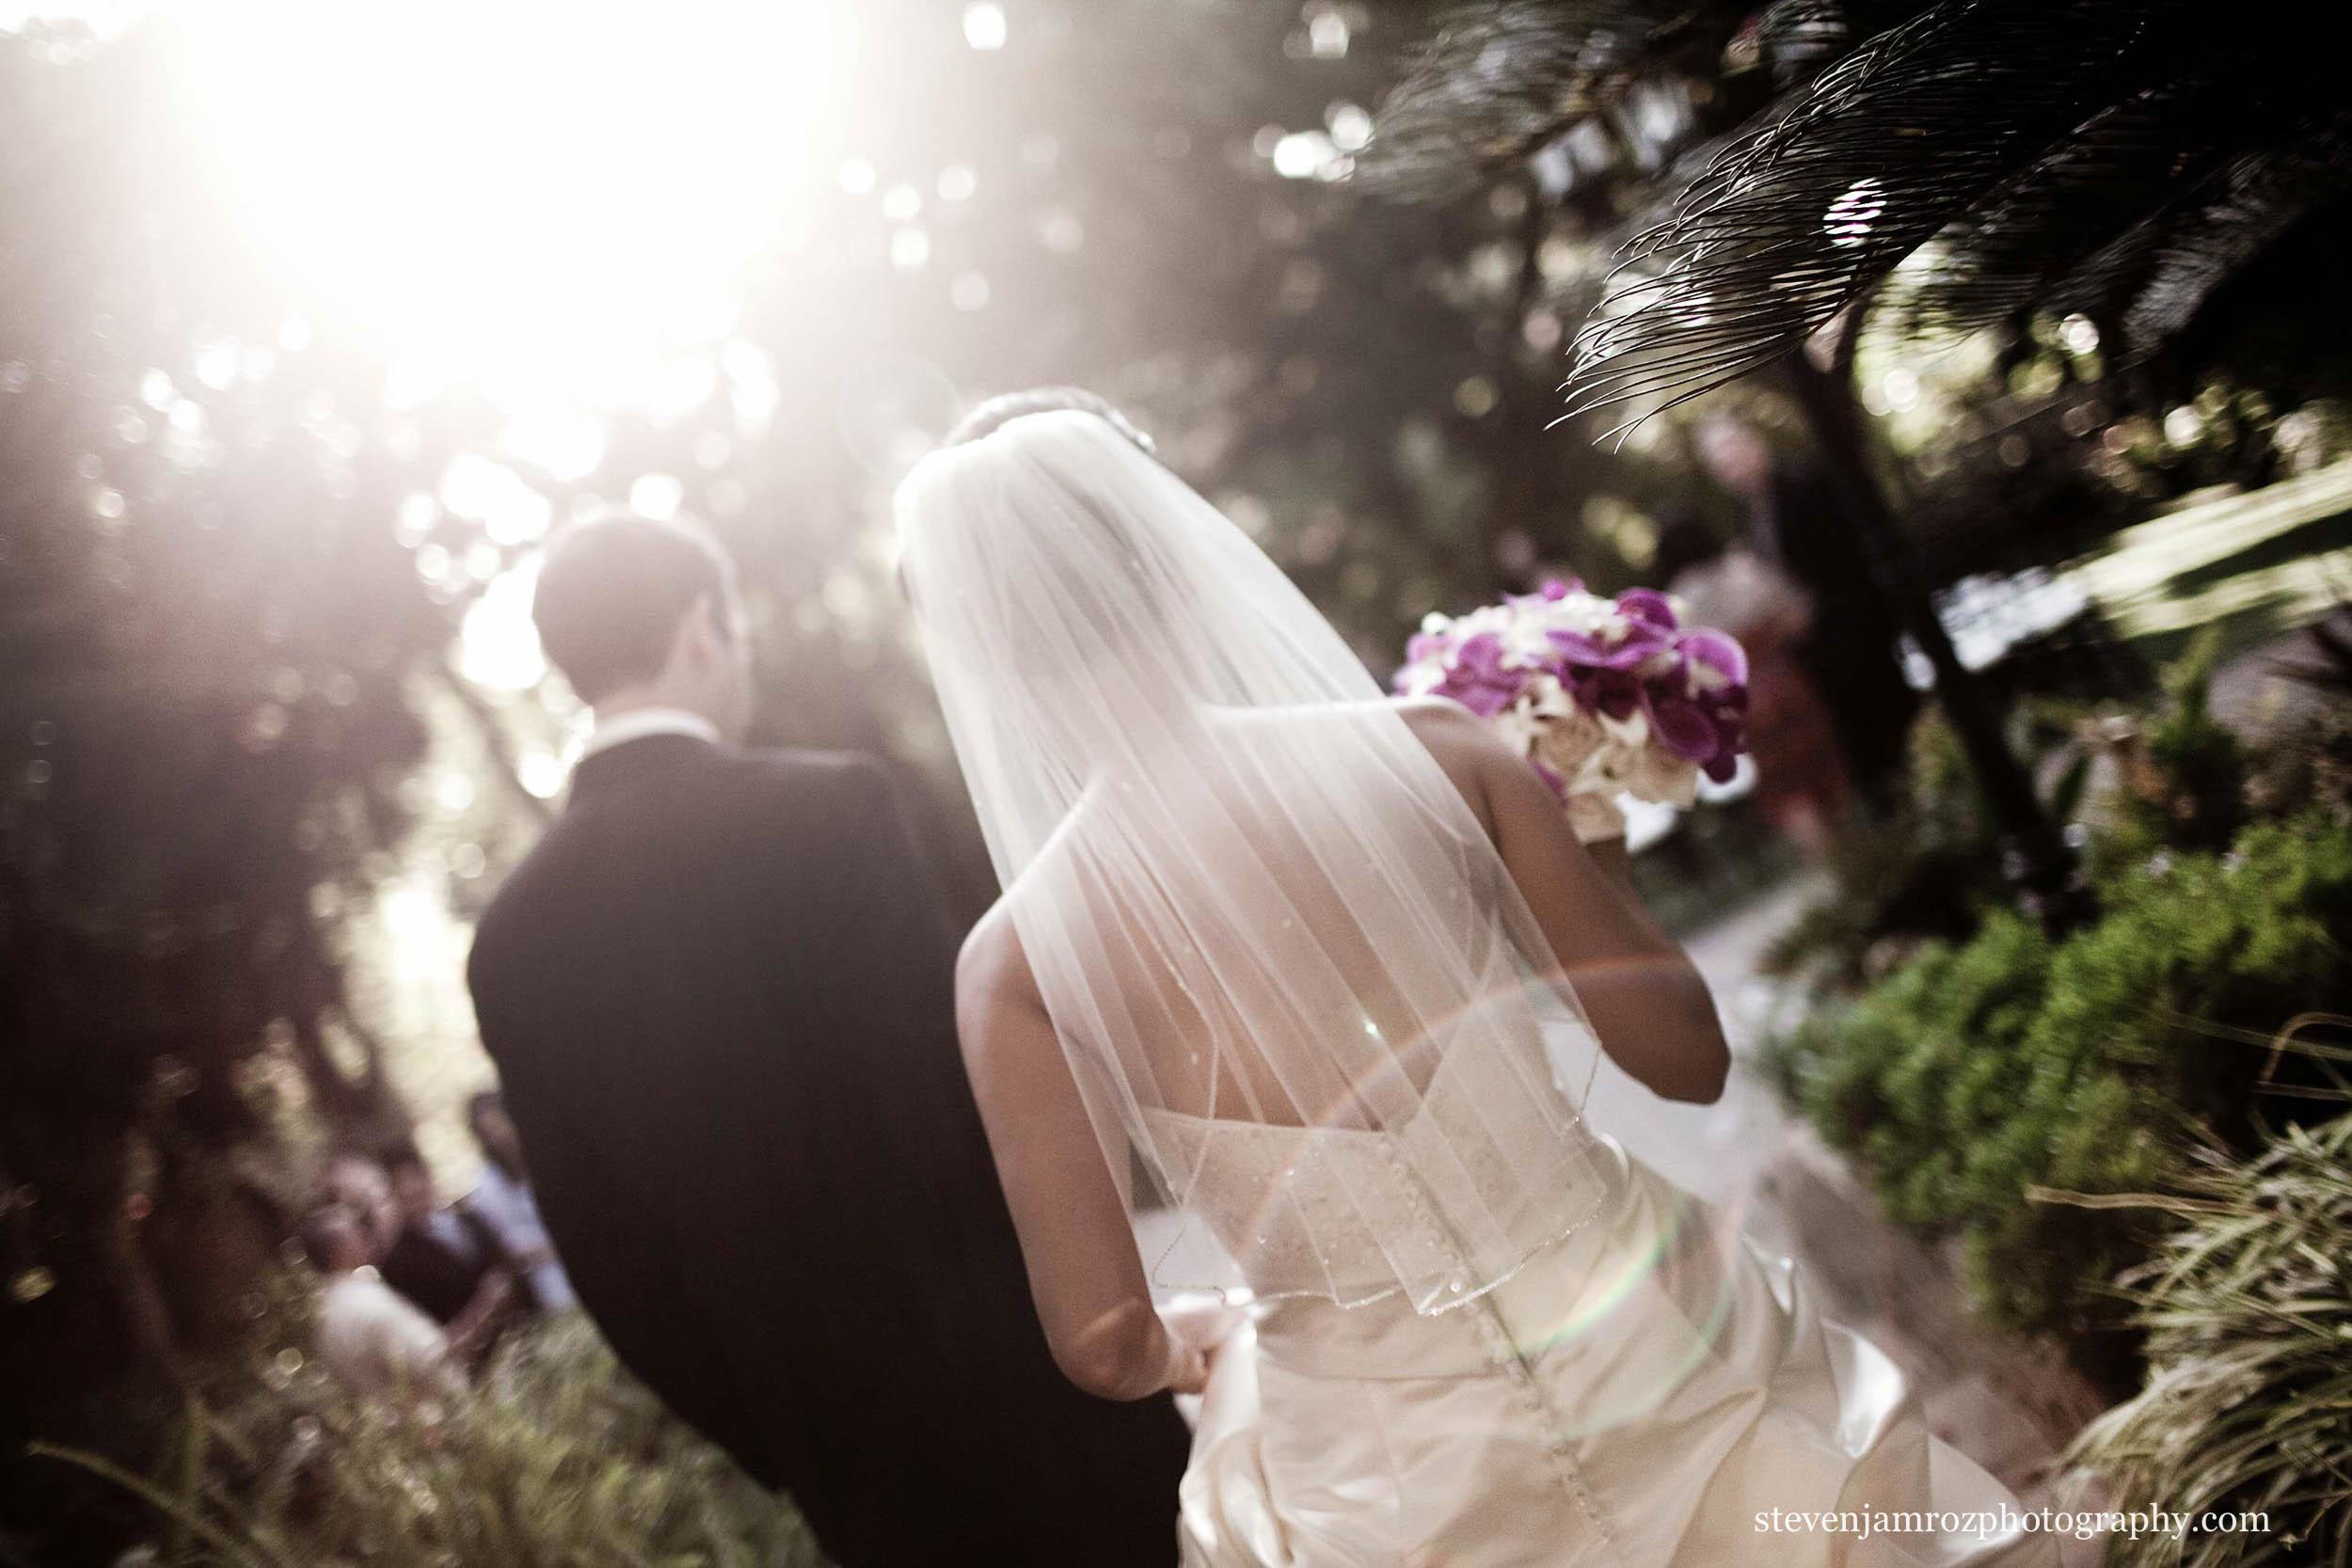 pretty-sunset-for-wedding-bride-groom-raleigh-photographer-0840.jpg